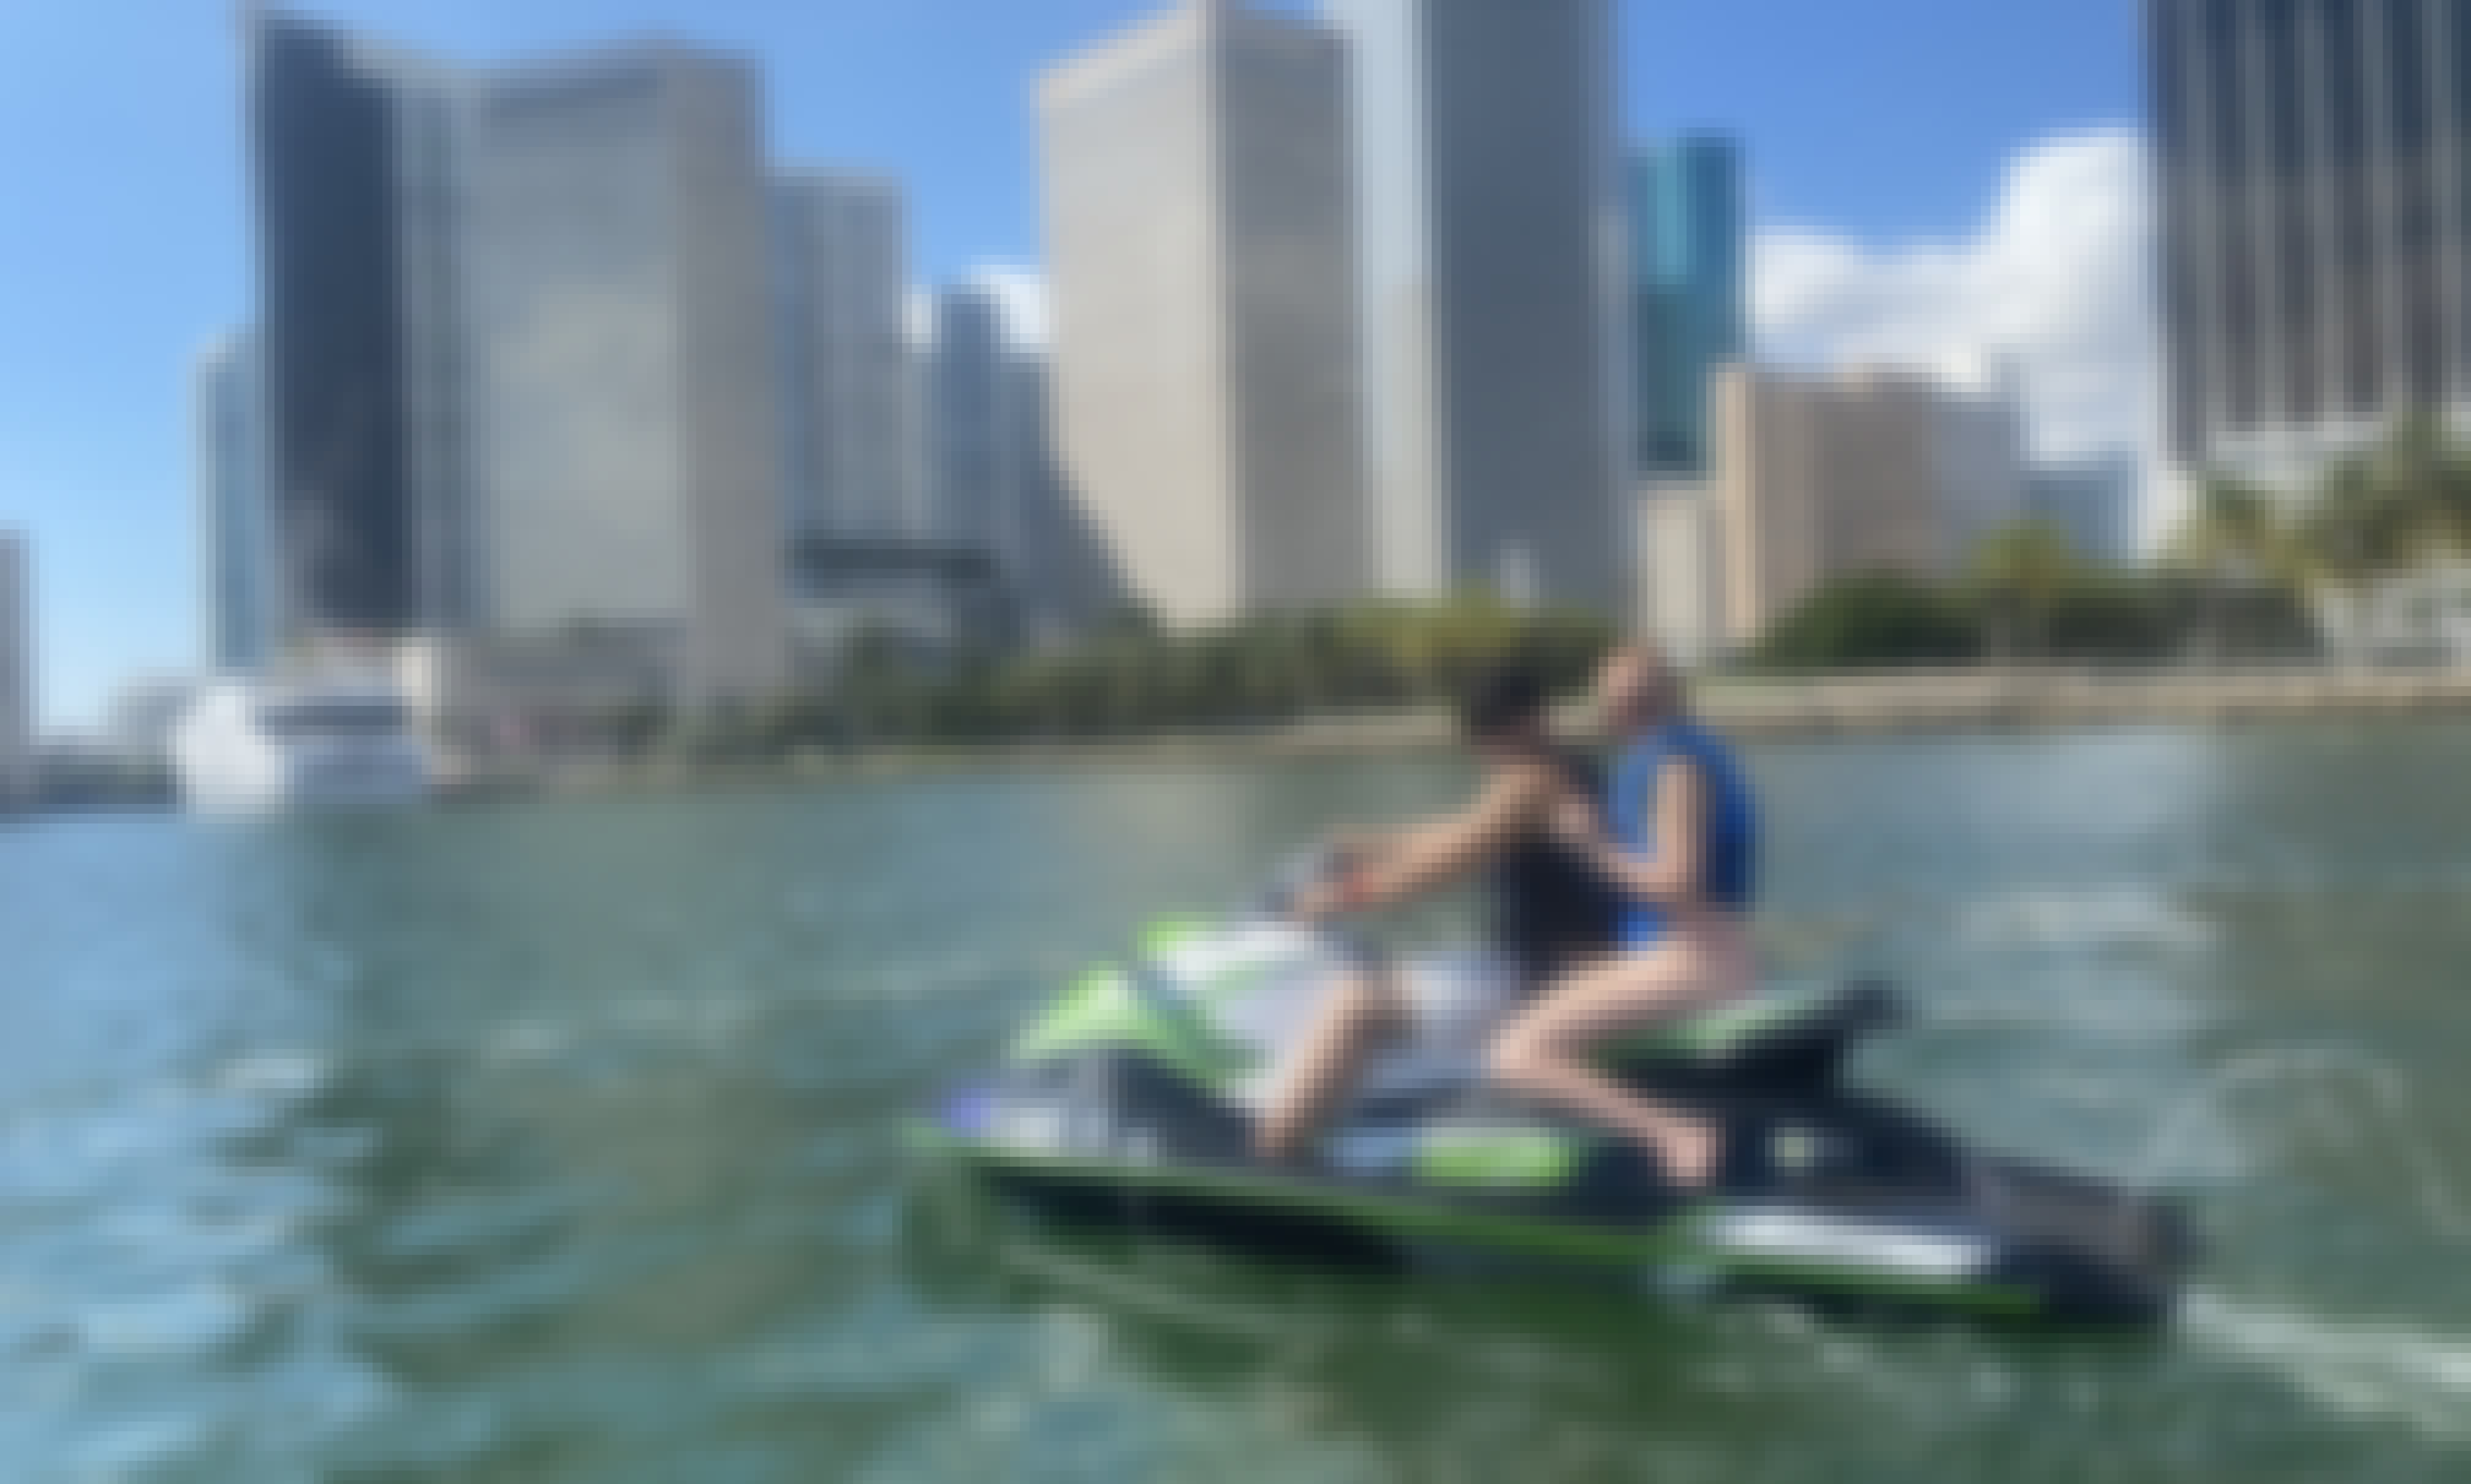 Jet Ski 2020 & 2021 for Rent in Miami Beach, Florida